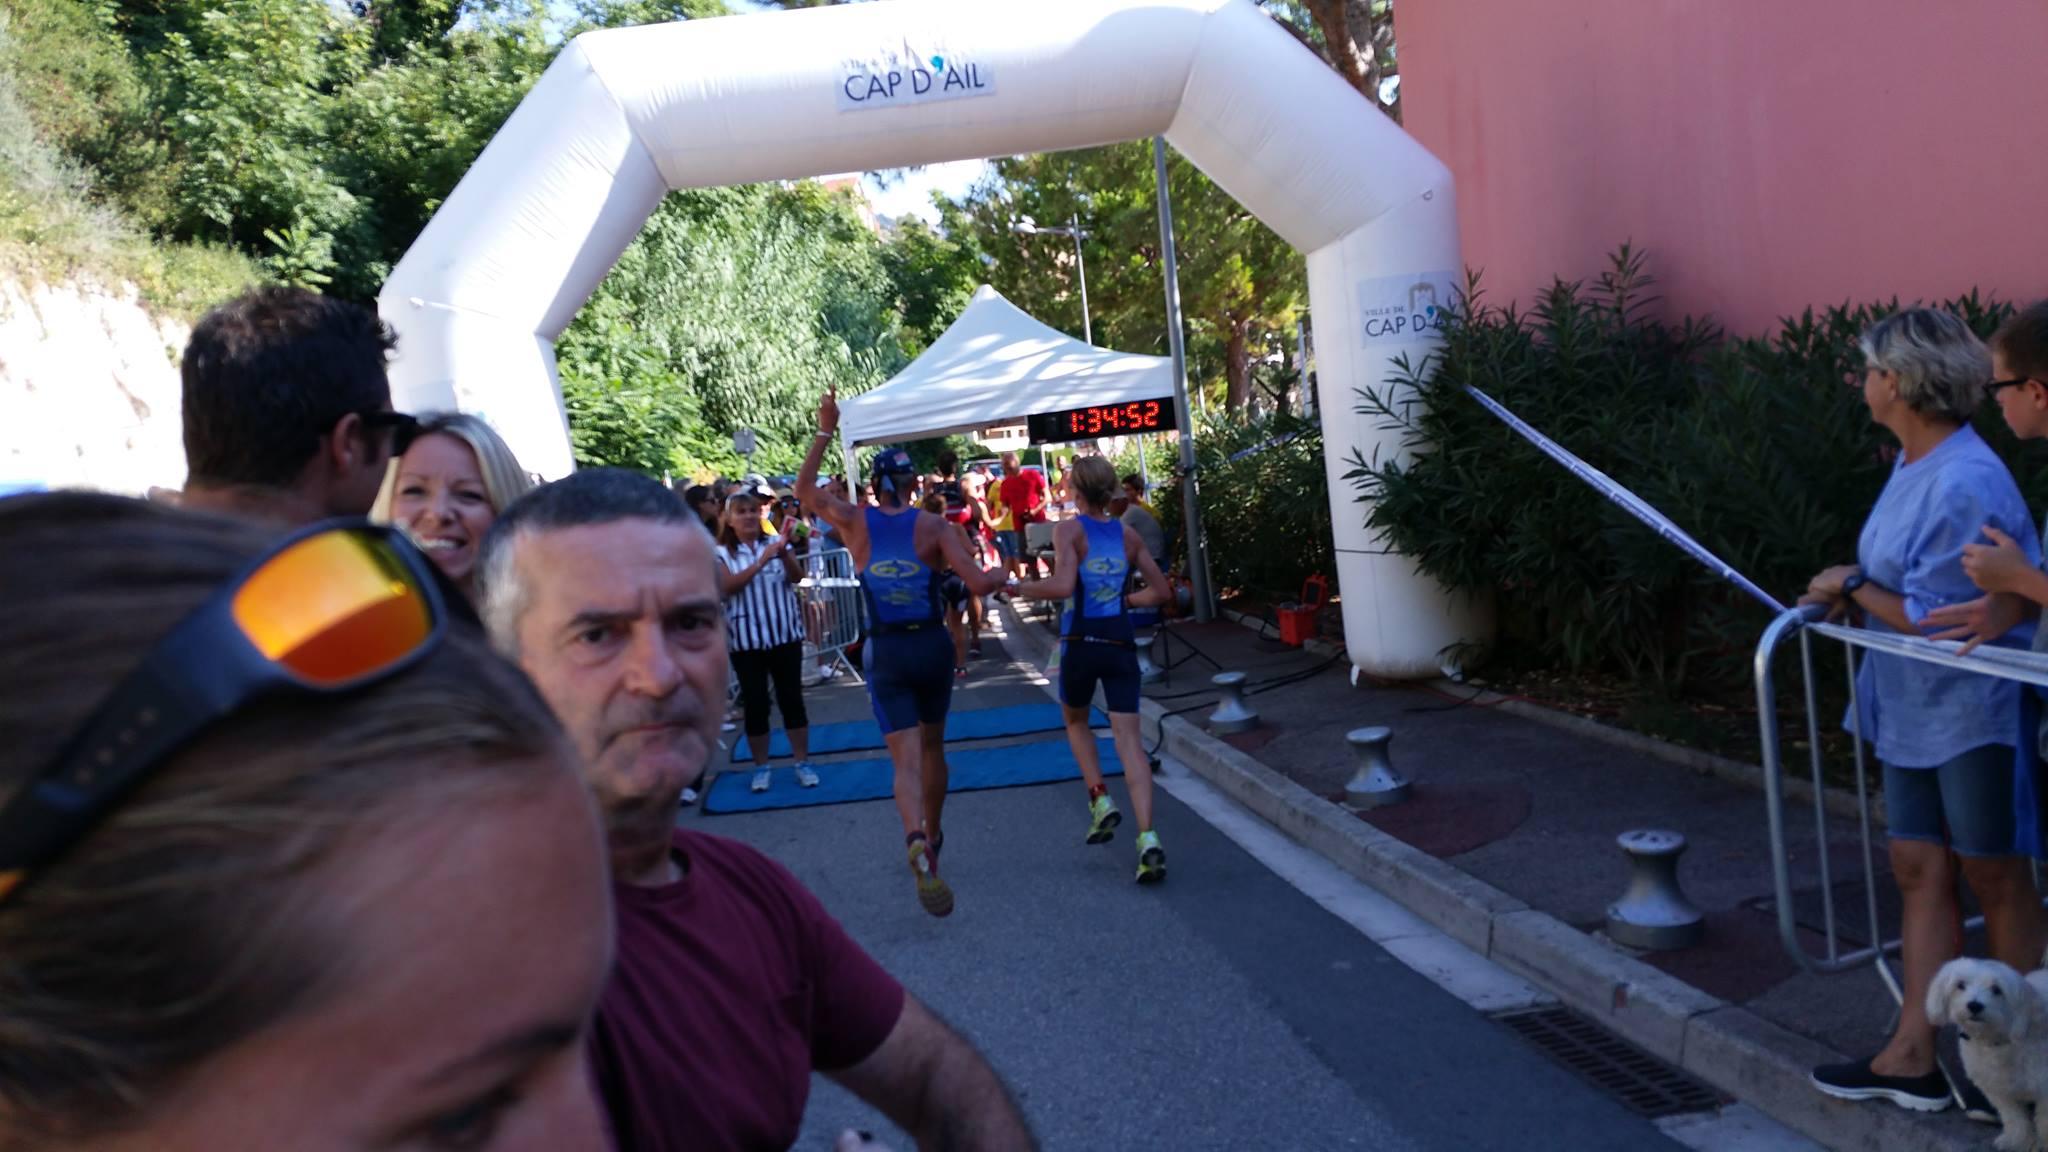 triathlon cap d'ail